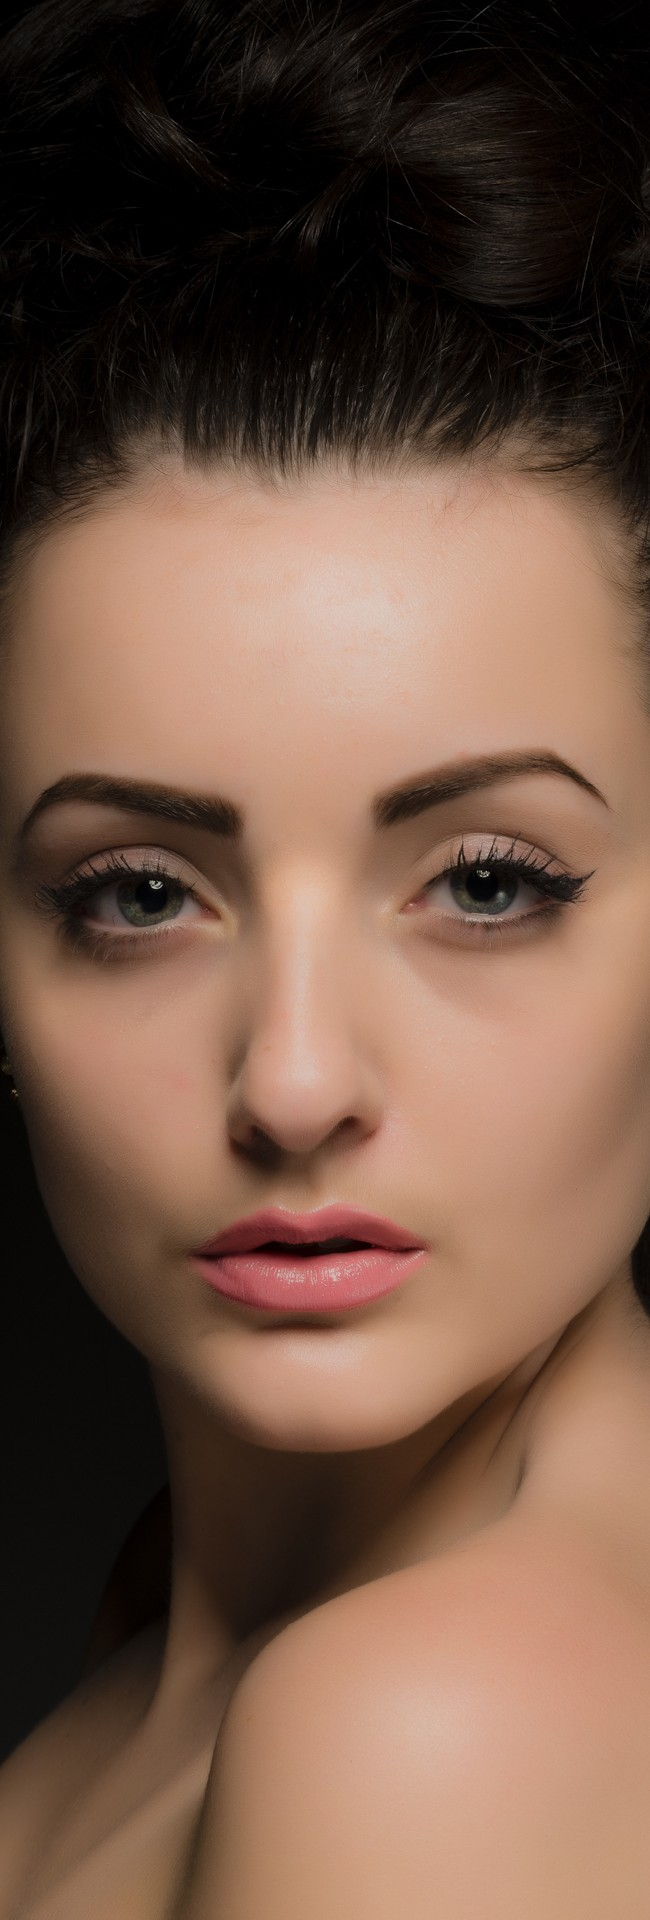 Beauty Studio Shot